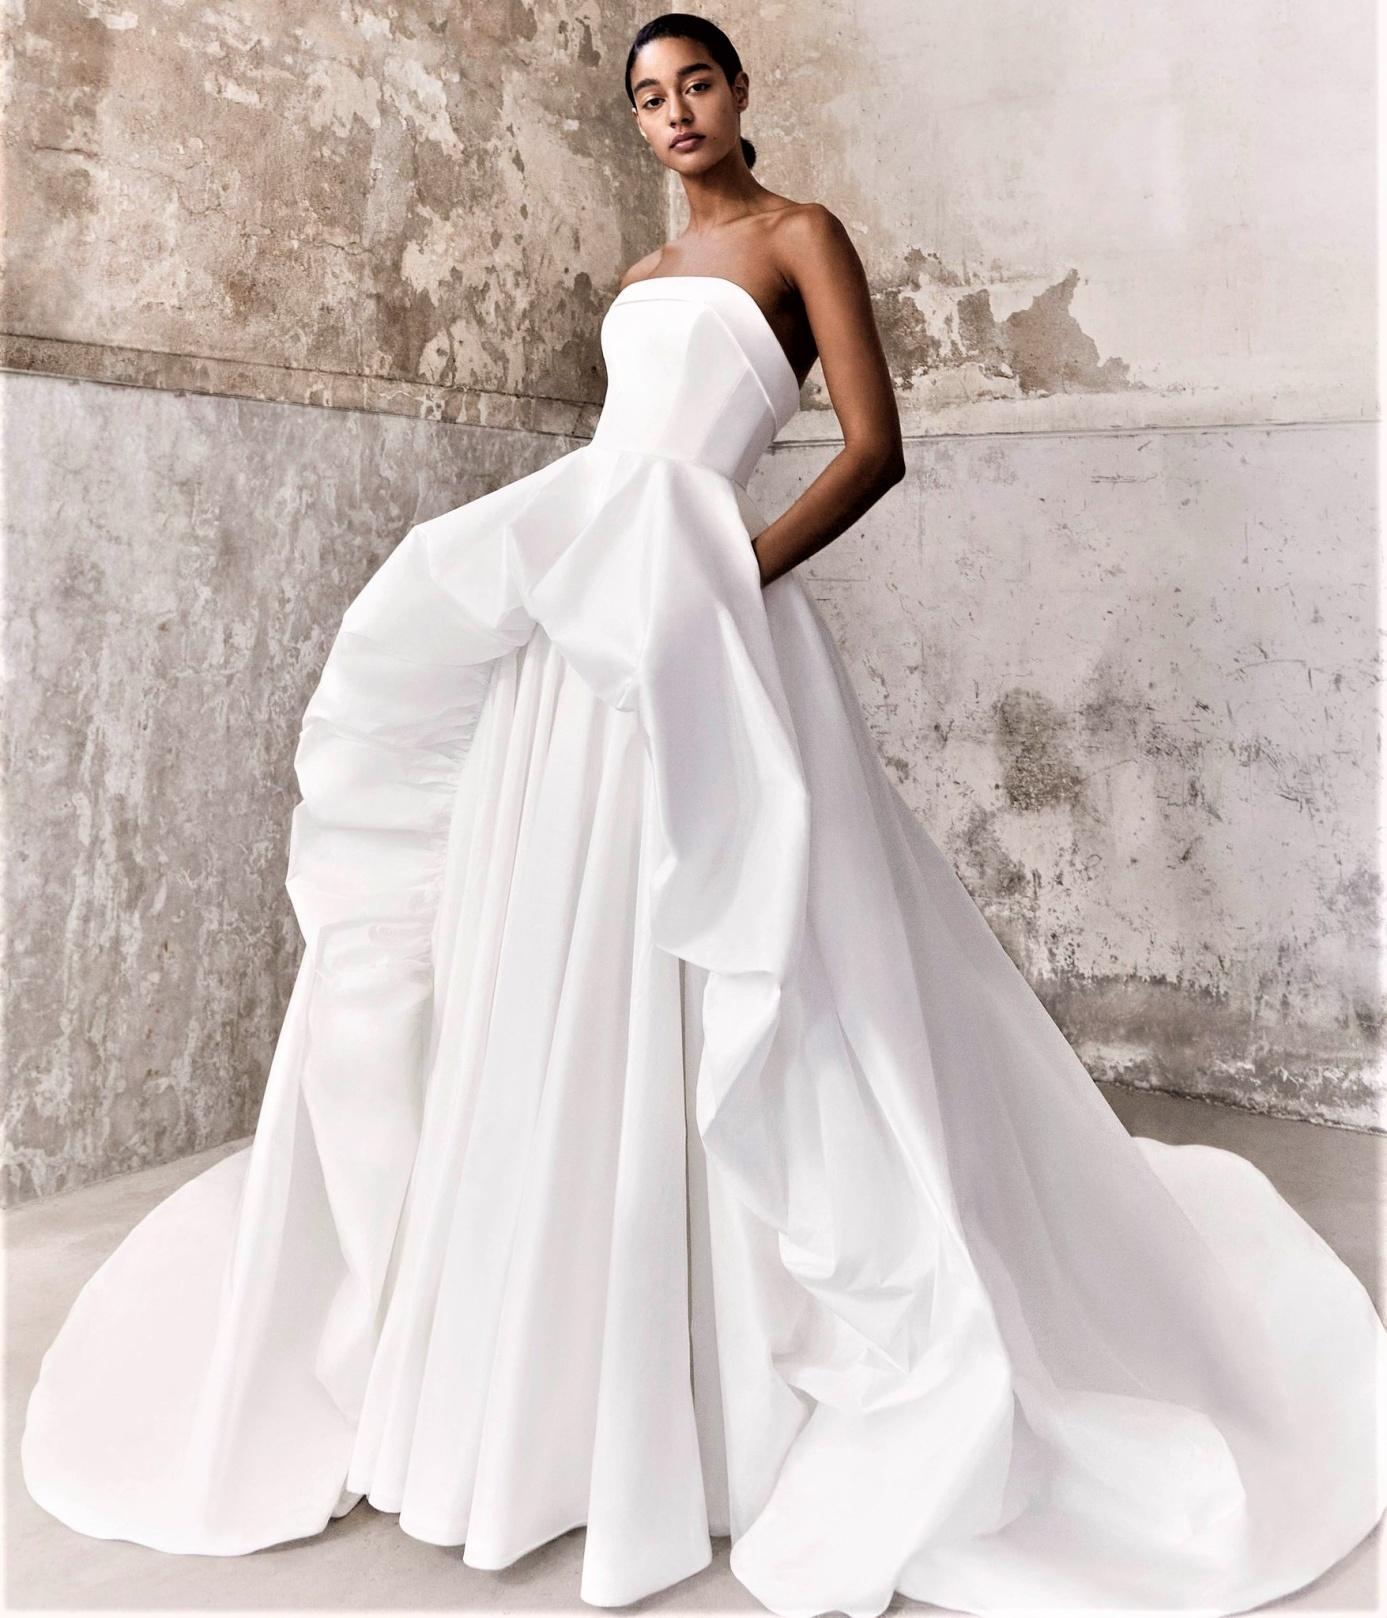 Viktor Rolf Mariage Volant gown Bridal 10-20 pynck (2) cropped.jpg